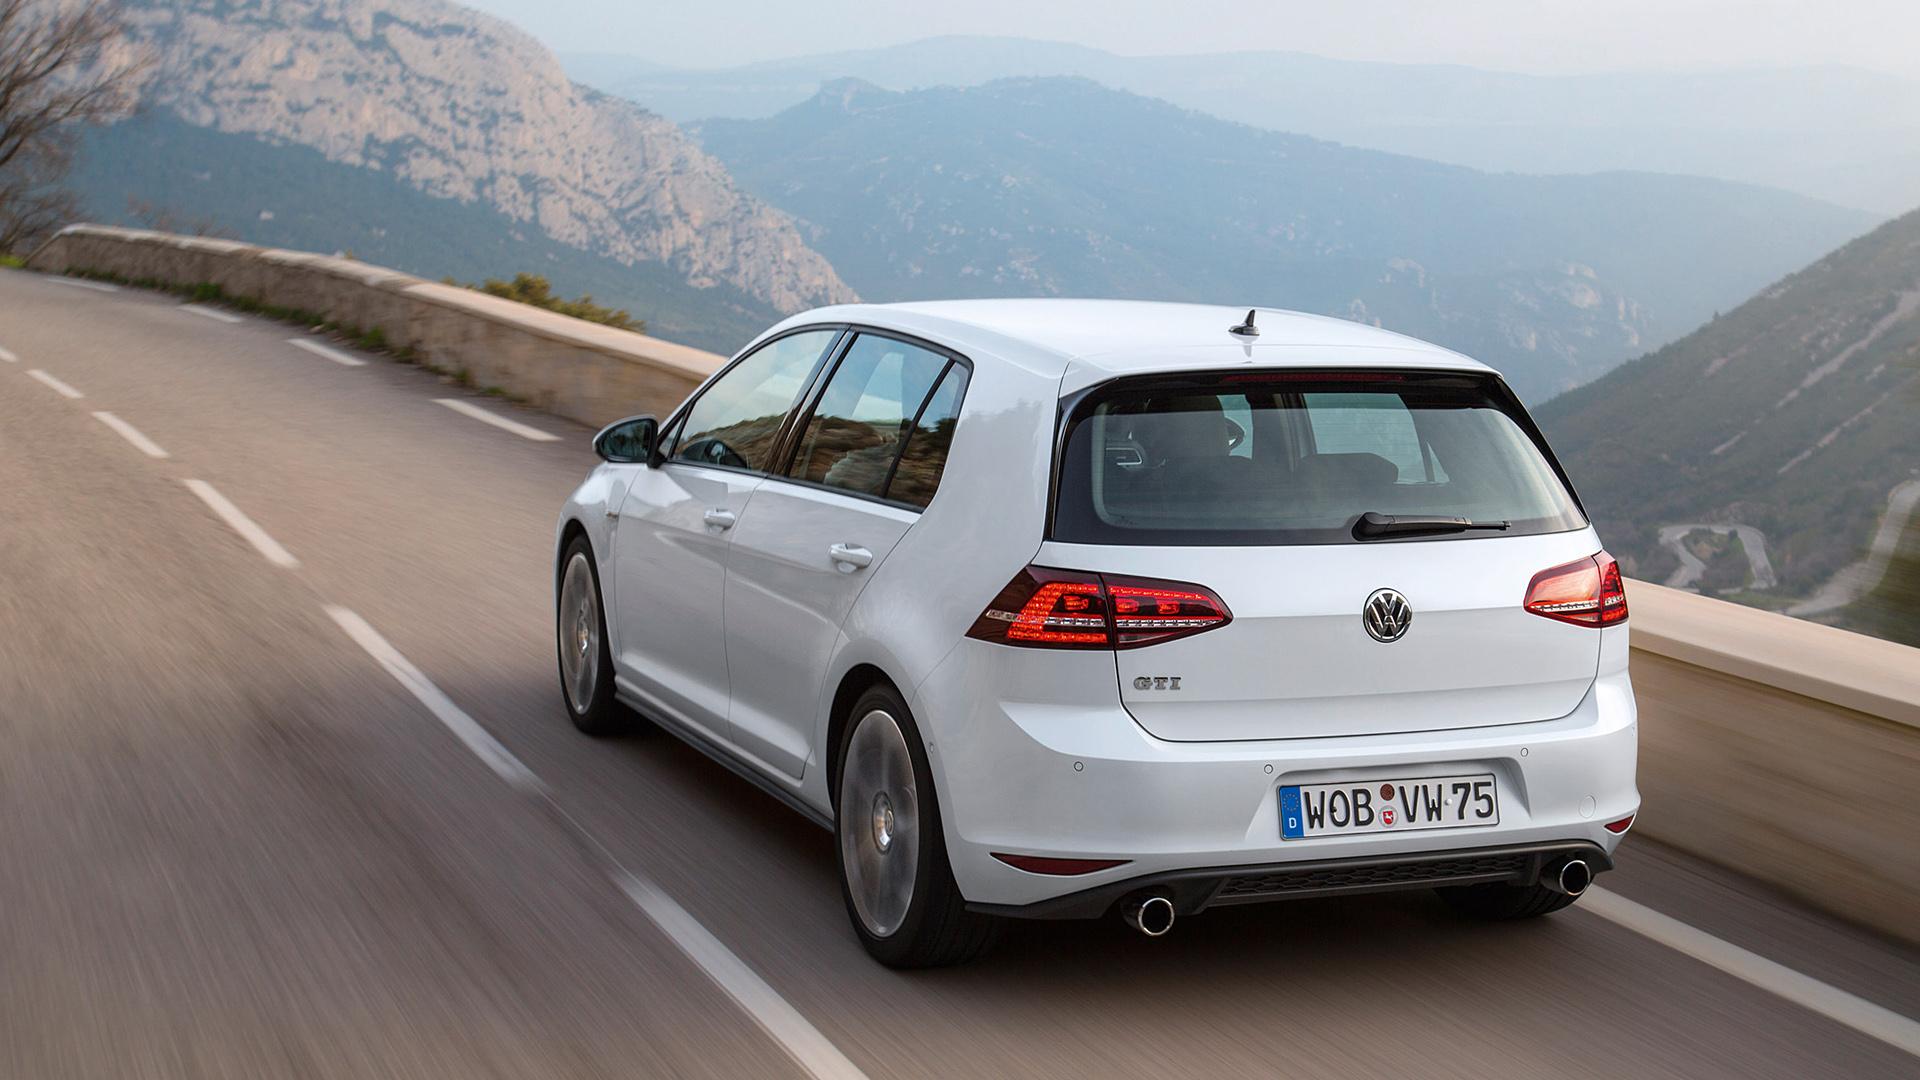 2014 Volkswagen Golf GTI Wallpaper   HD 1920x1080